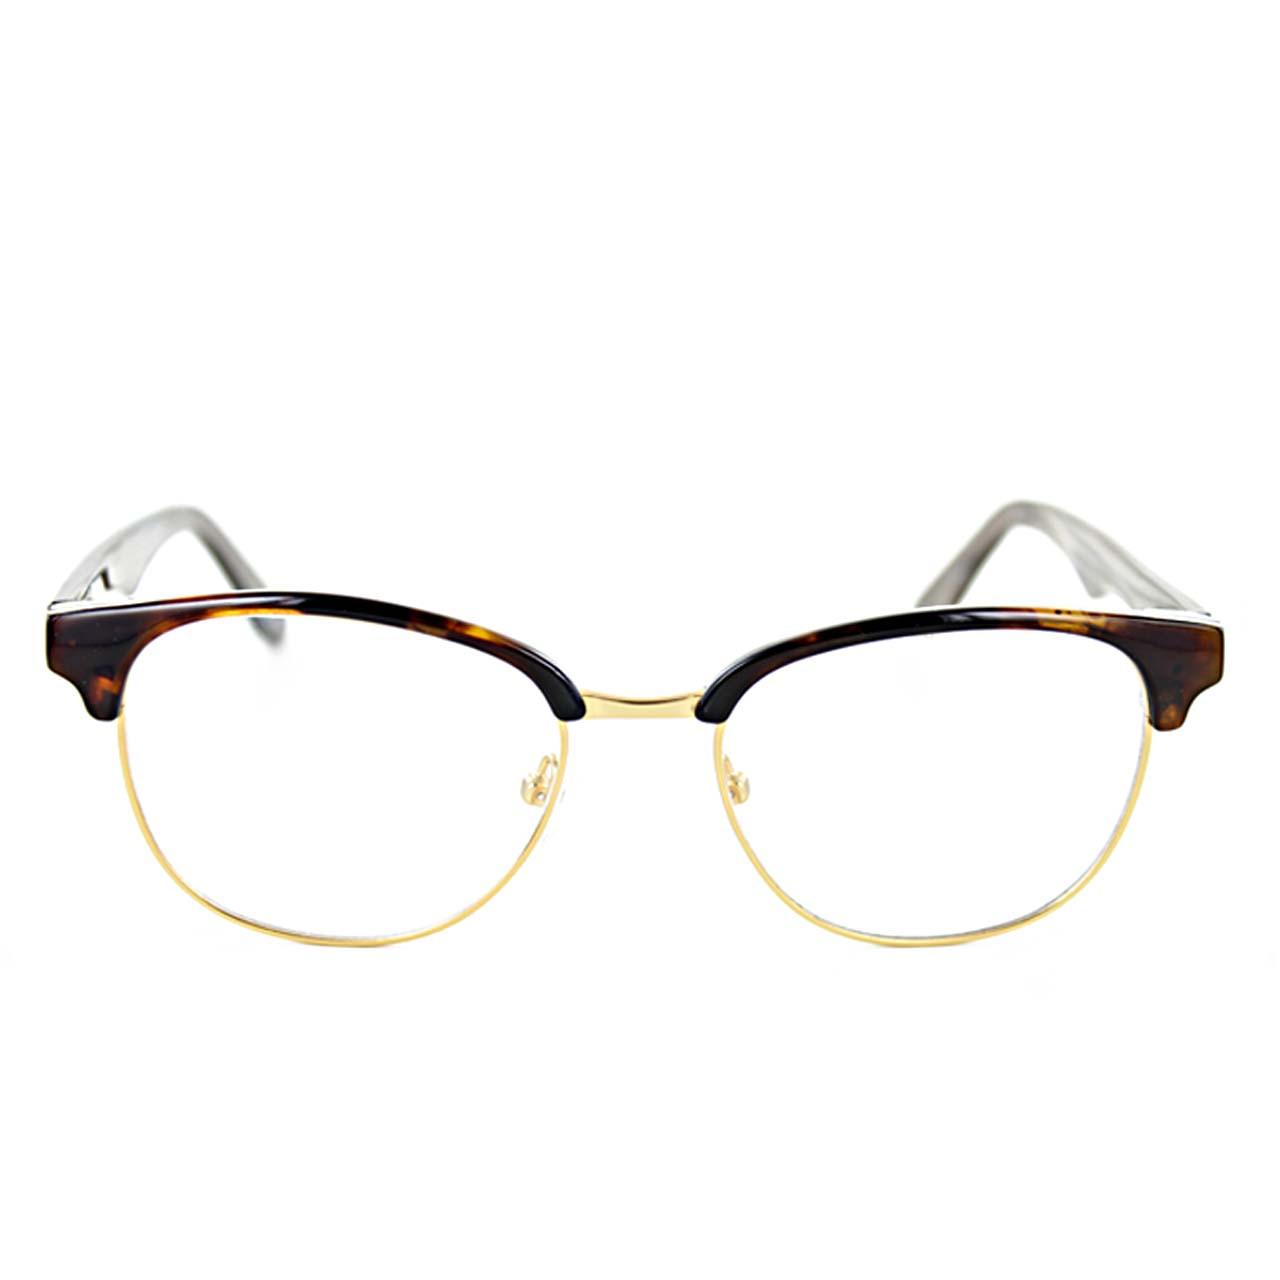 GEEK Eyewear Style Quantum For Her